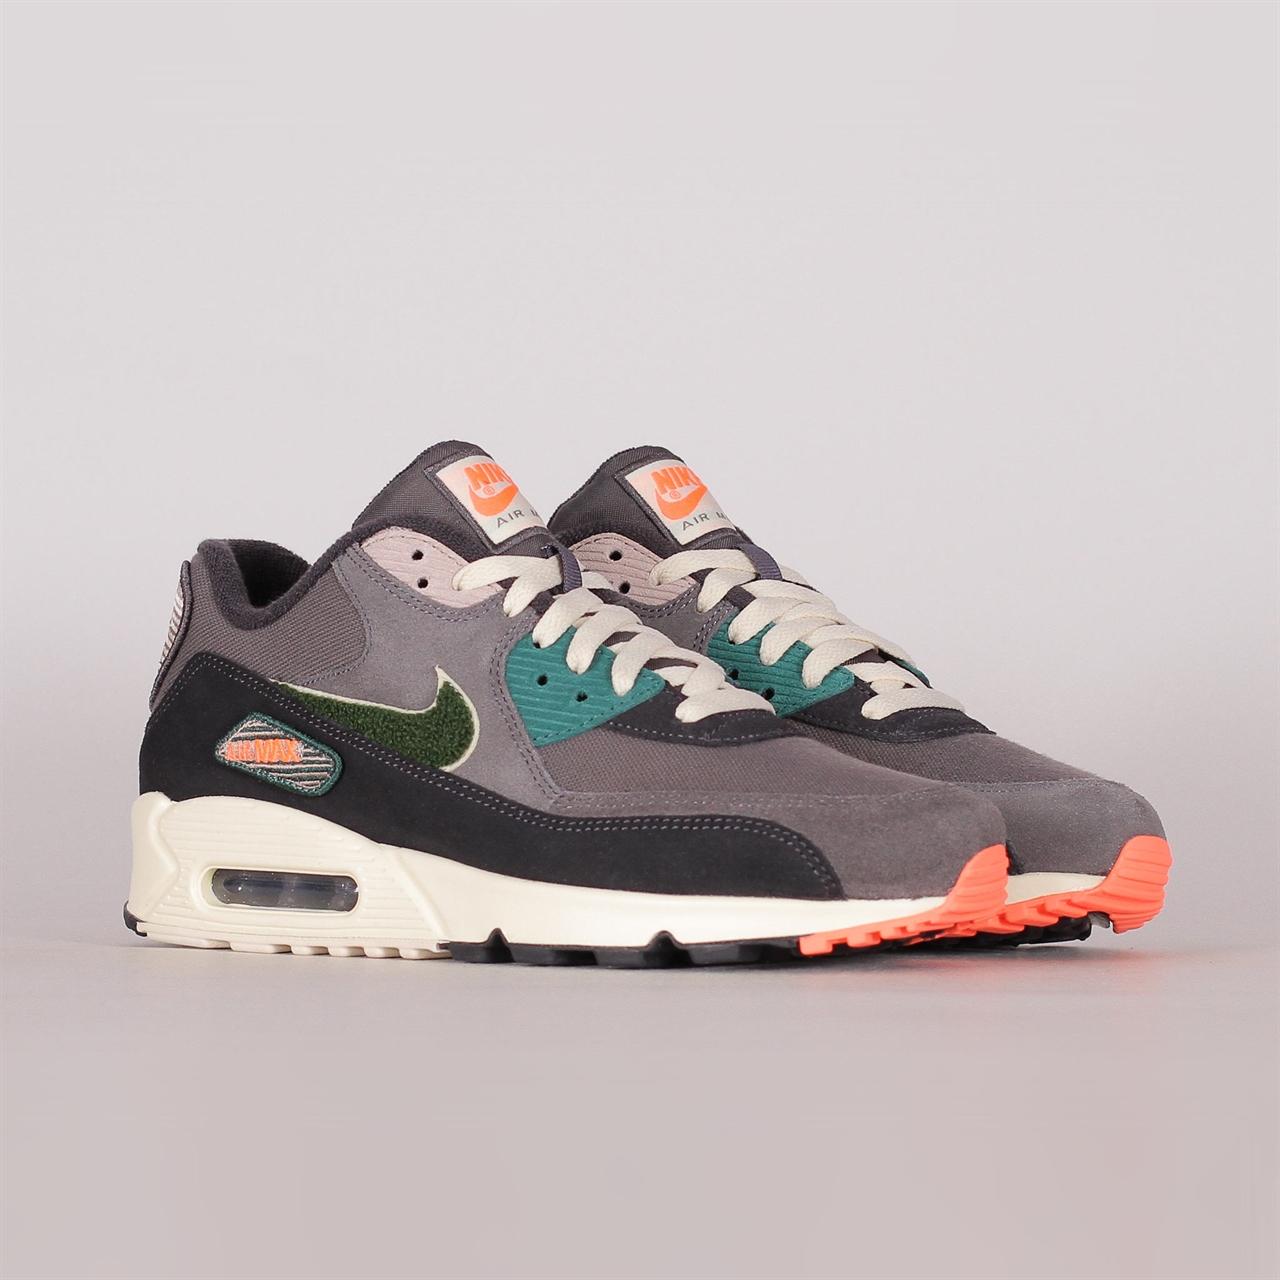 8744137413 Nike Sportswear Air Max 90 Premium SE (858954-002) - Shelta